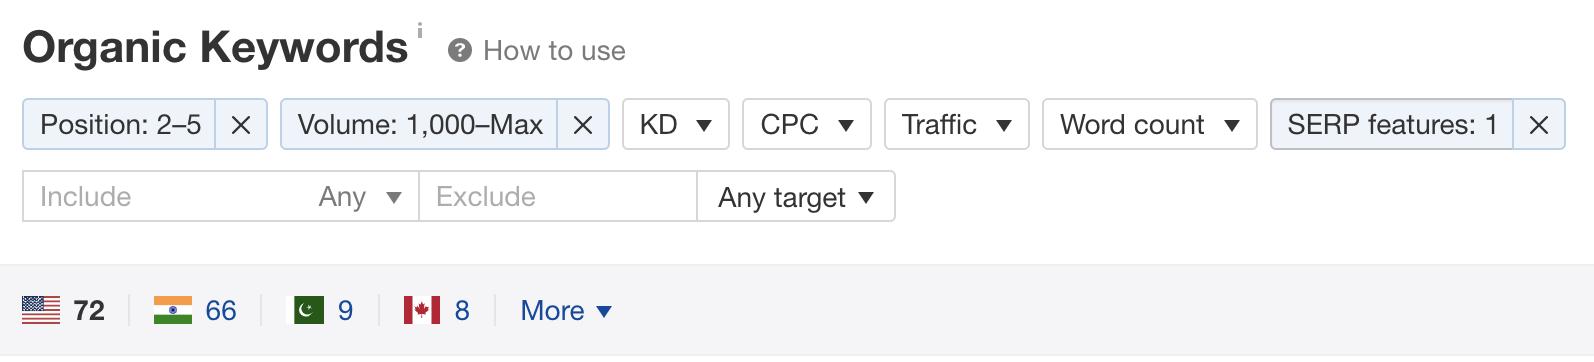 24 organic keywords filters